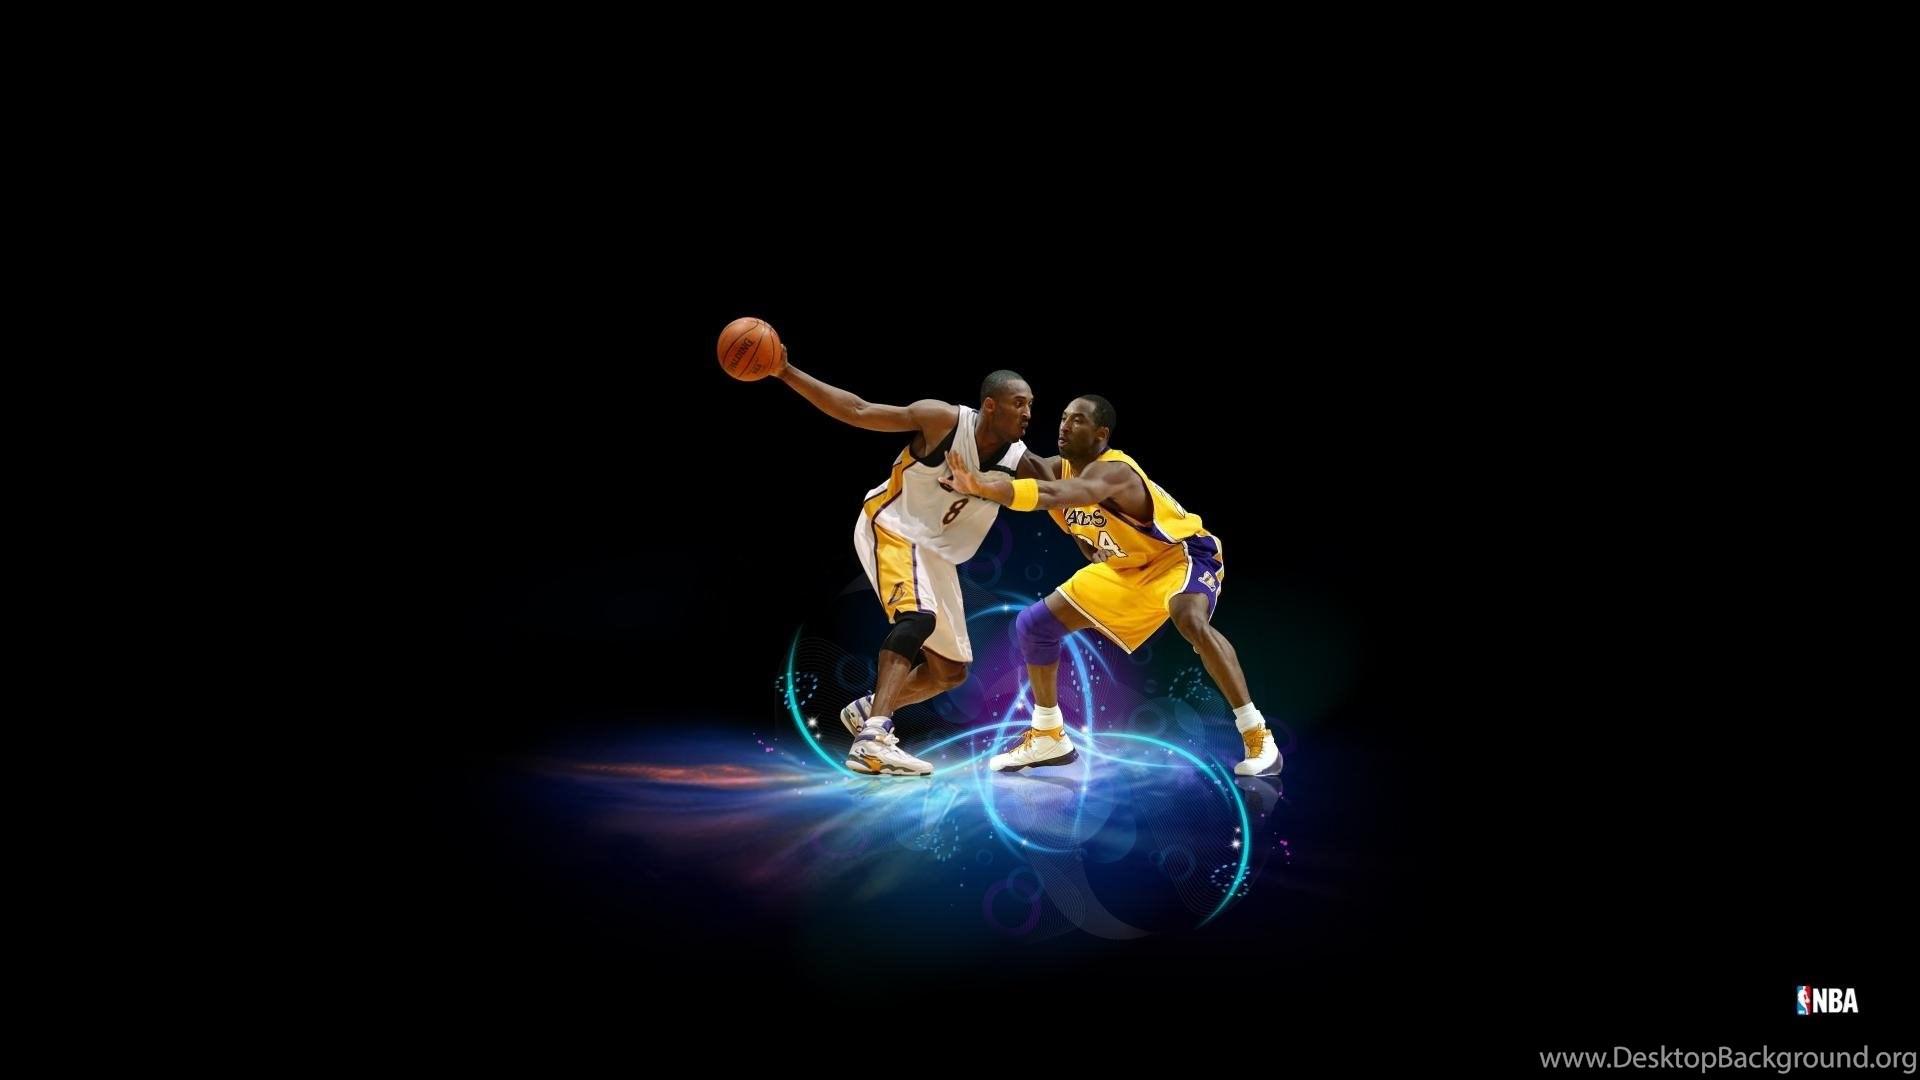 Fantastic Wallpaper High Quality Basketball - 60388_basketball-wallpapers-high-quality_1920x1080_h  You Should Have_337819.jpg